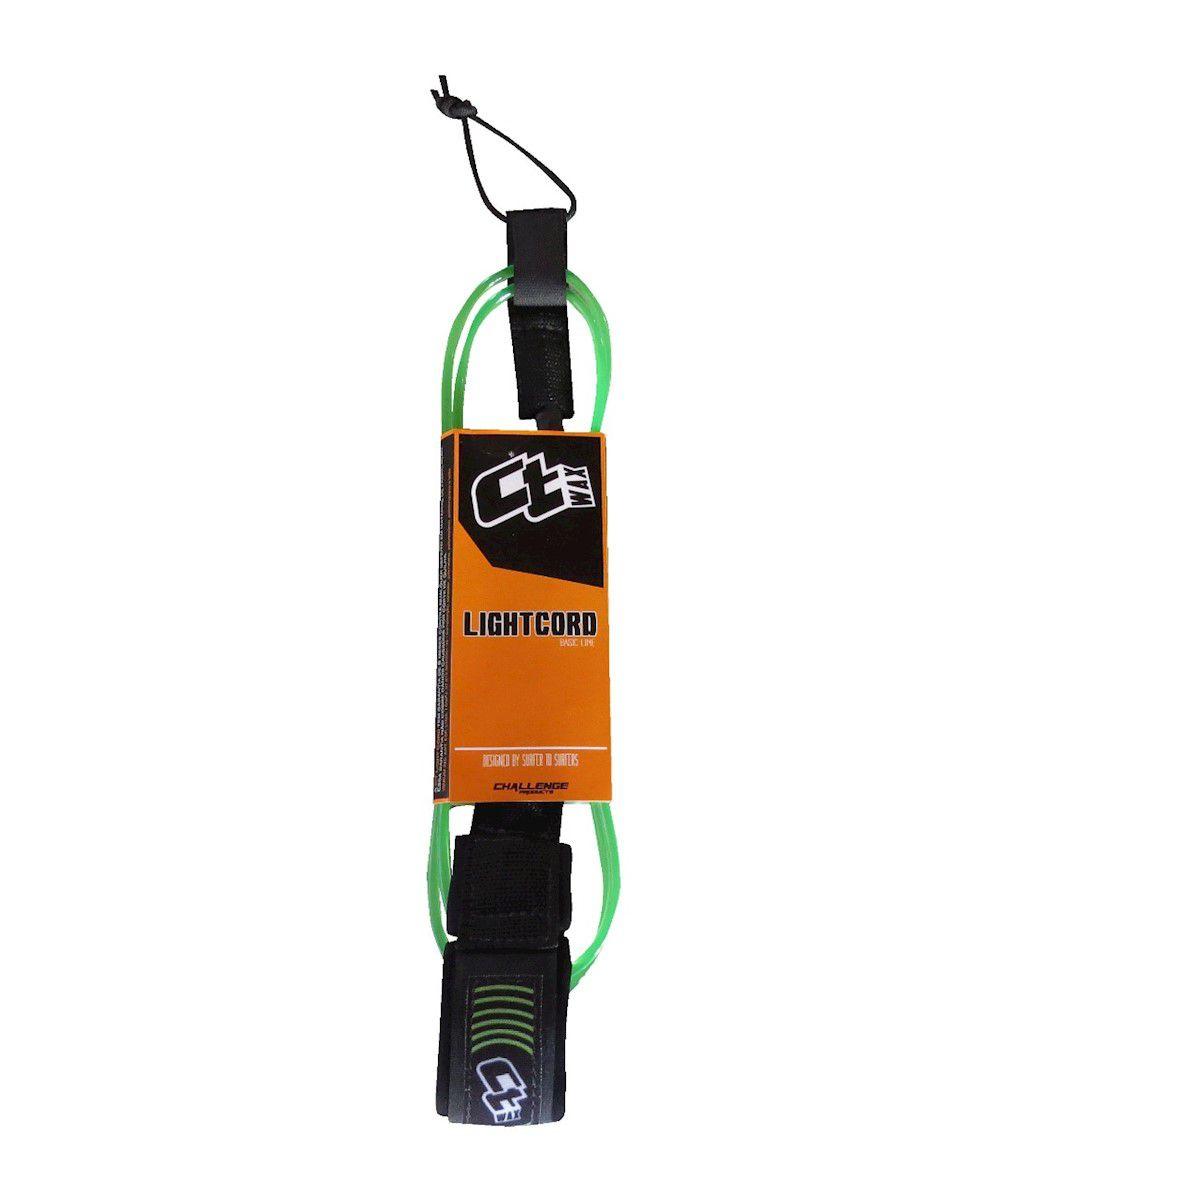 Leash Ct Wax Lightcord Comp 5'5 Pés Verde